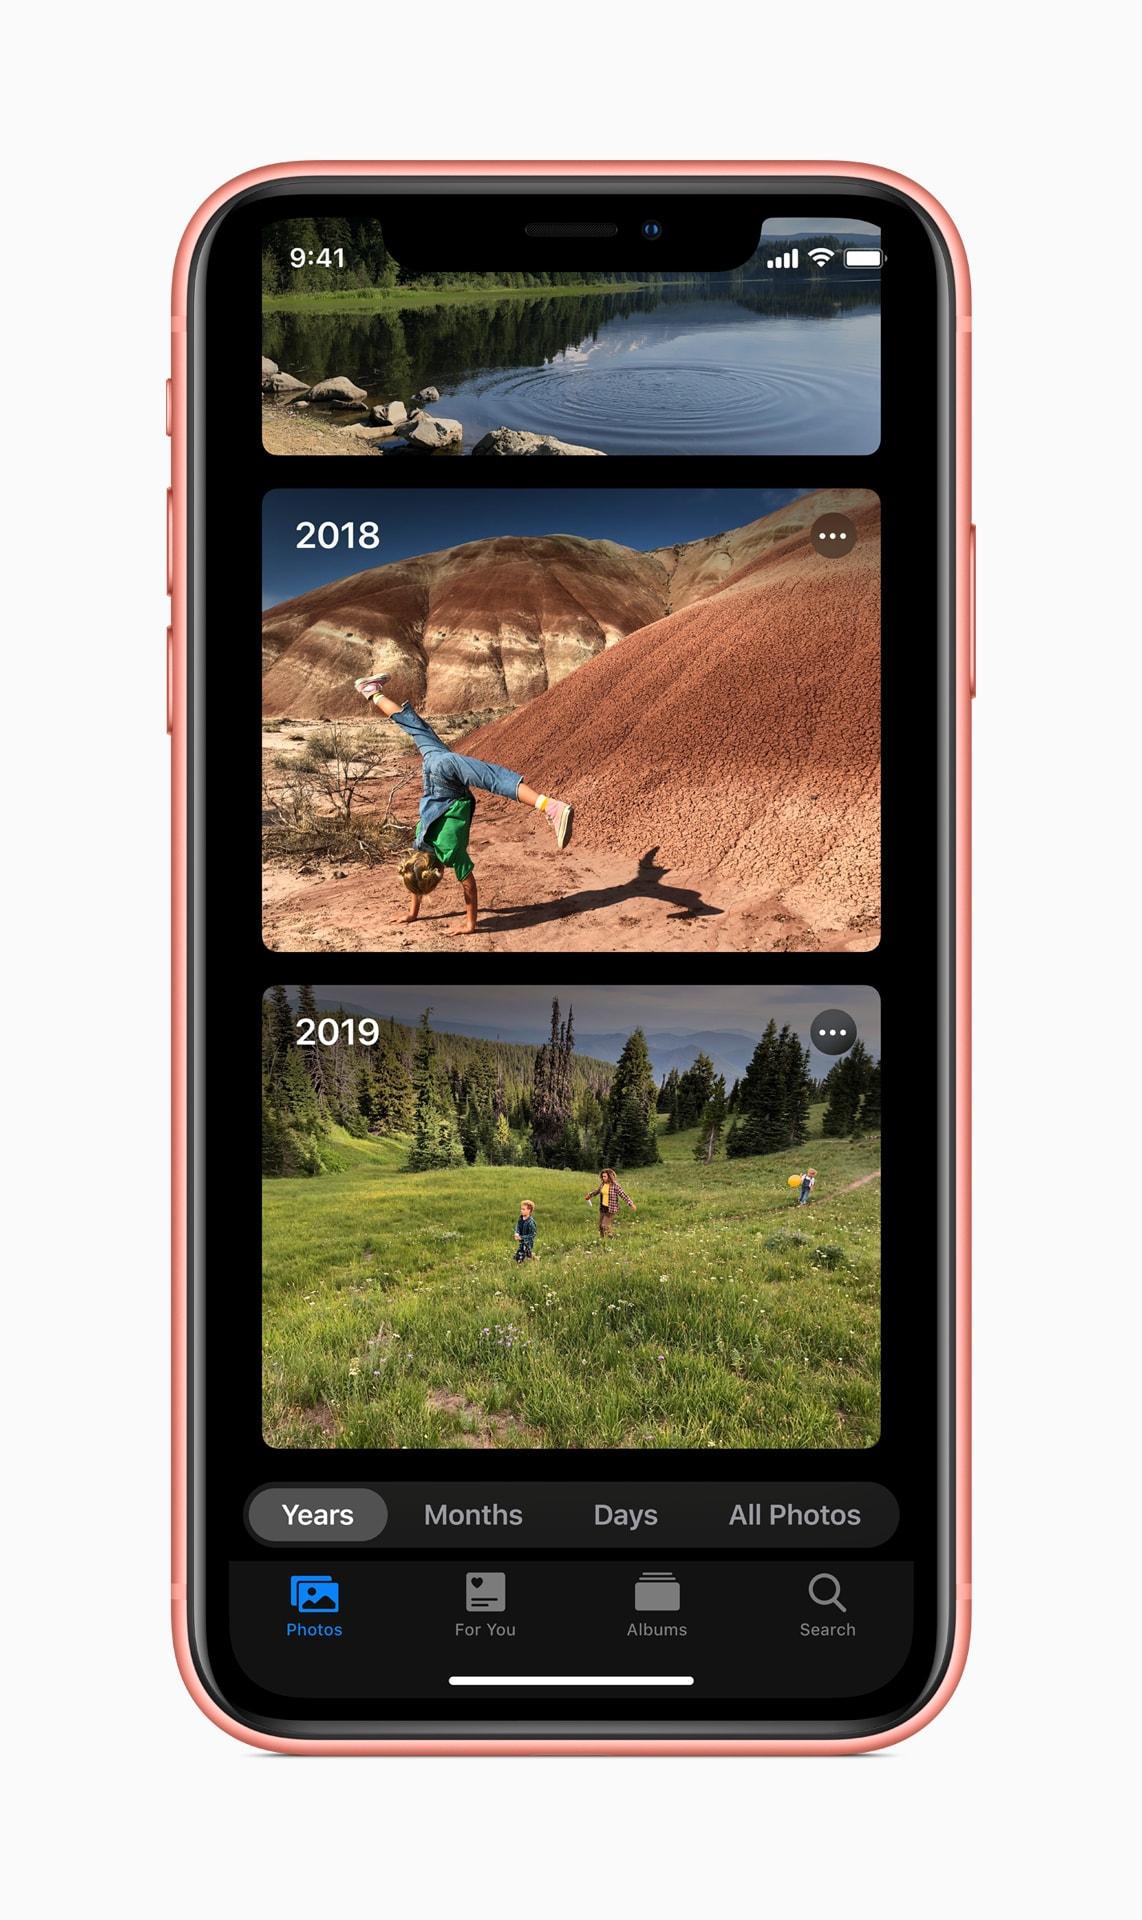 Navegando por fotos no iOS 13